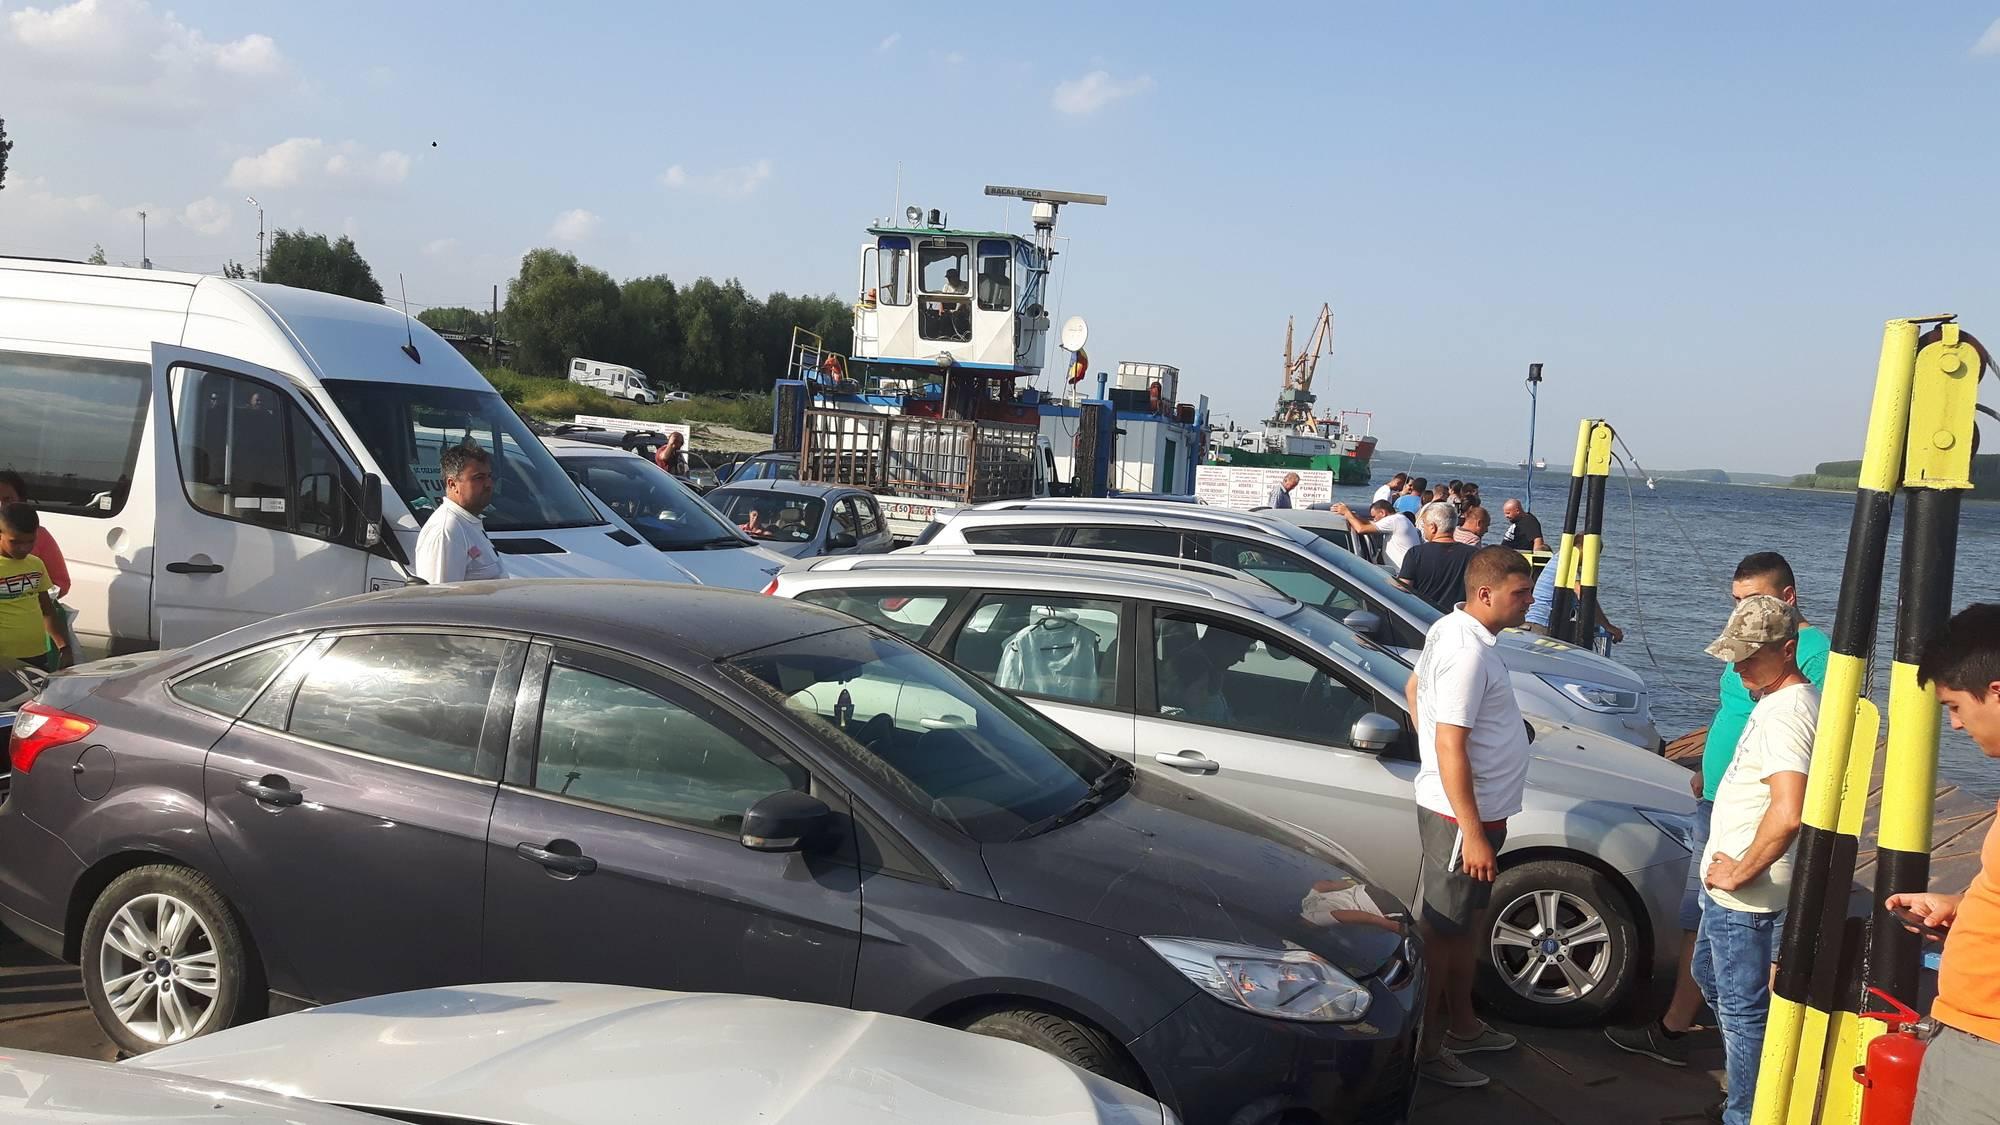 Traversee-Danube-bac_07-09-2018_05